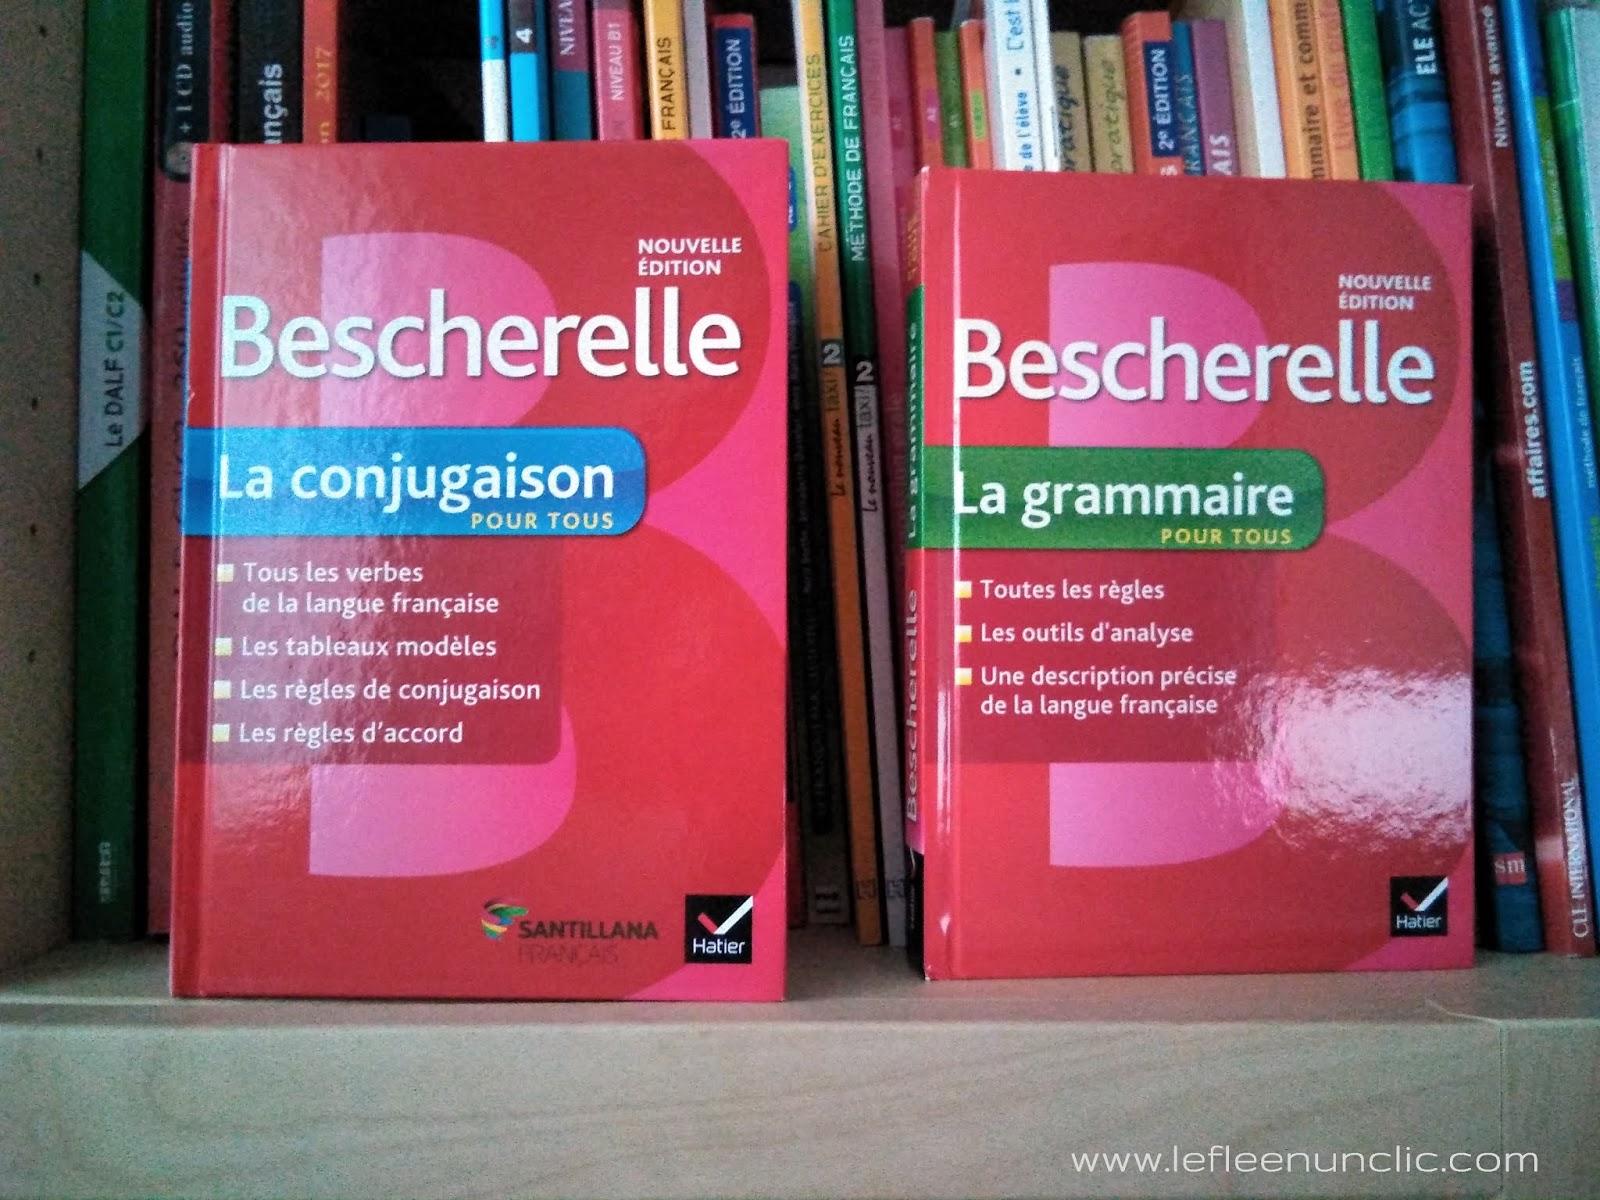 bescherelle, bescherelle la conjugaison pour tous, bescherelle la grammaire  pour tous, Santillana français